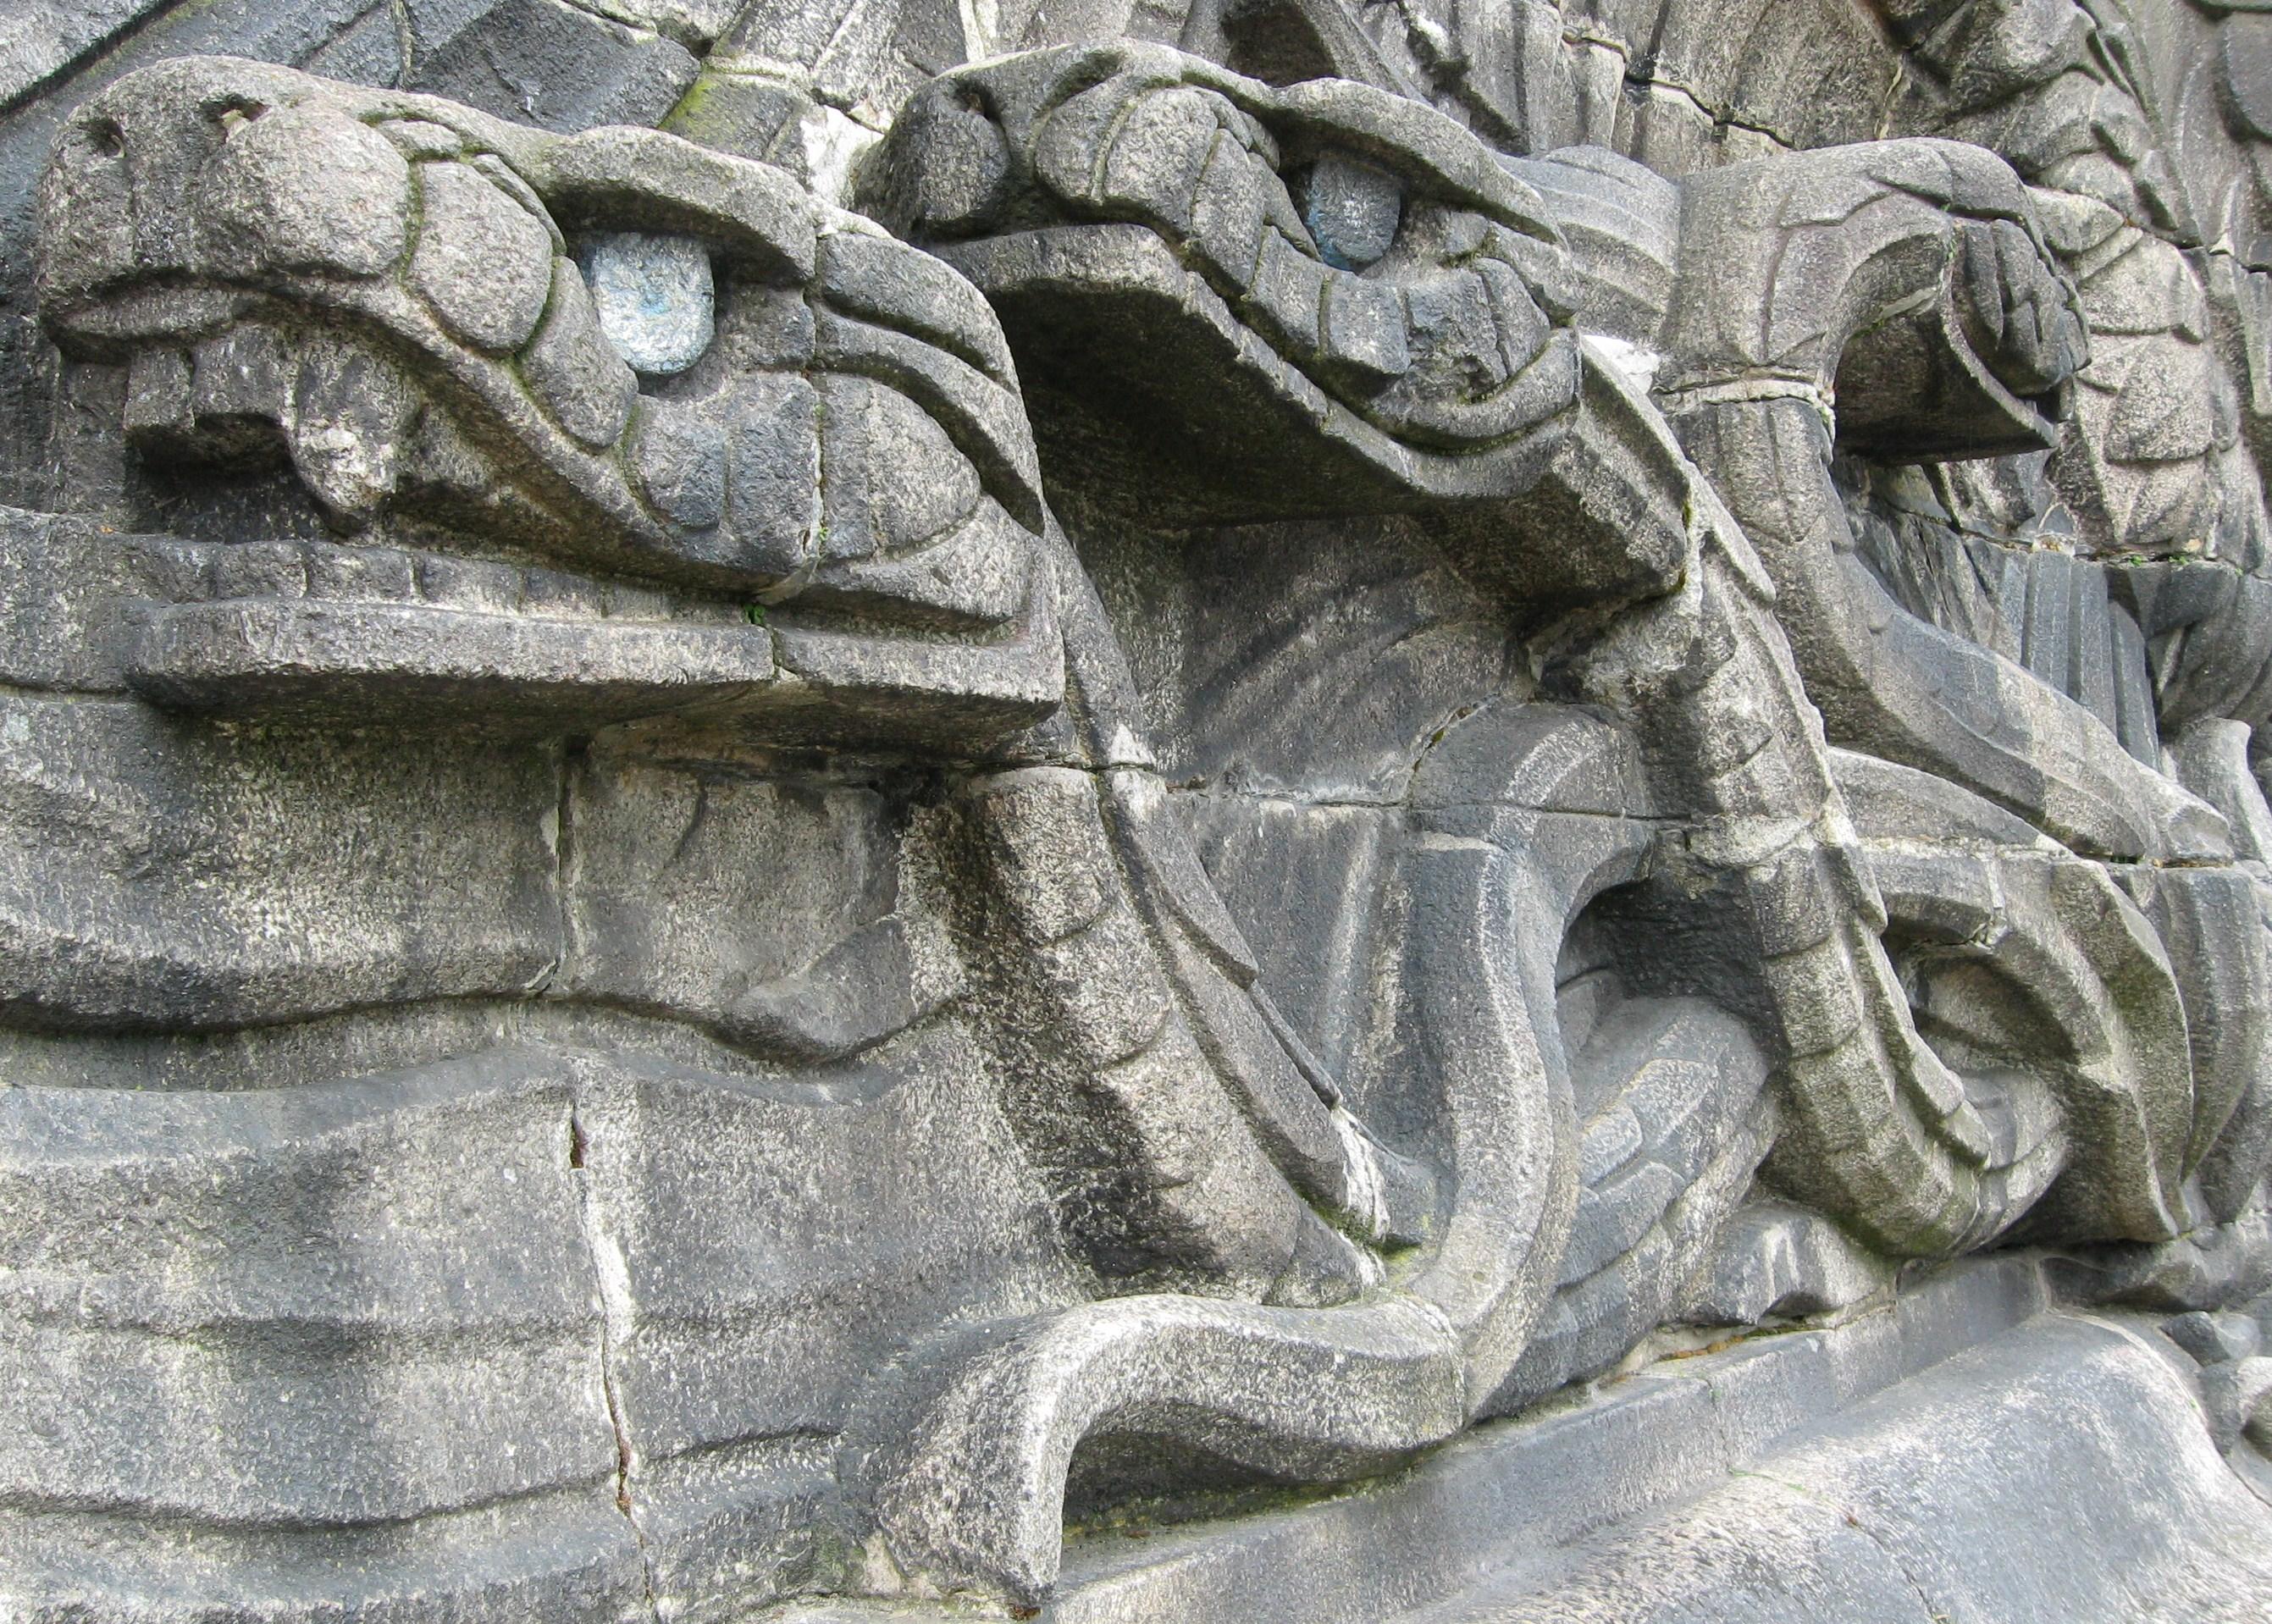 Stone Snakes, Deutsches Eck, Koblenz, Germany